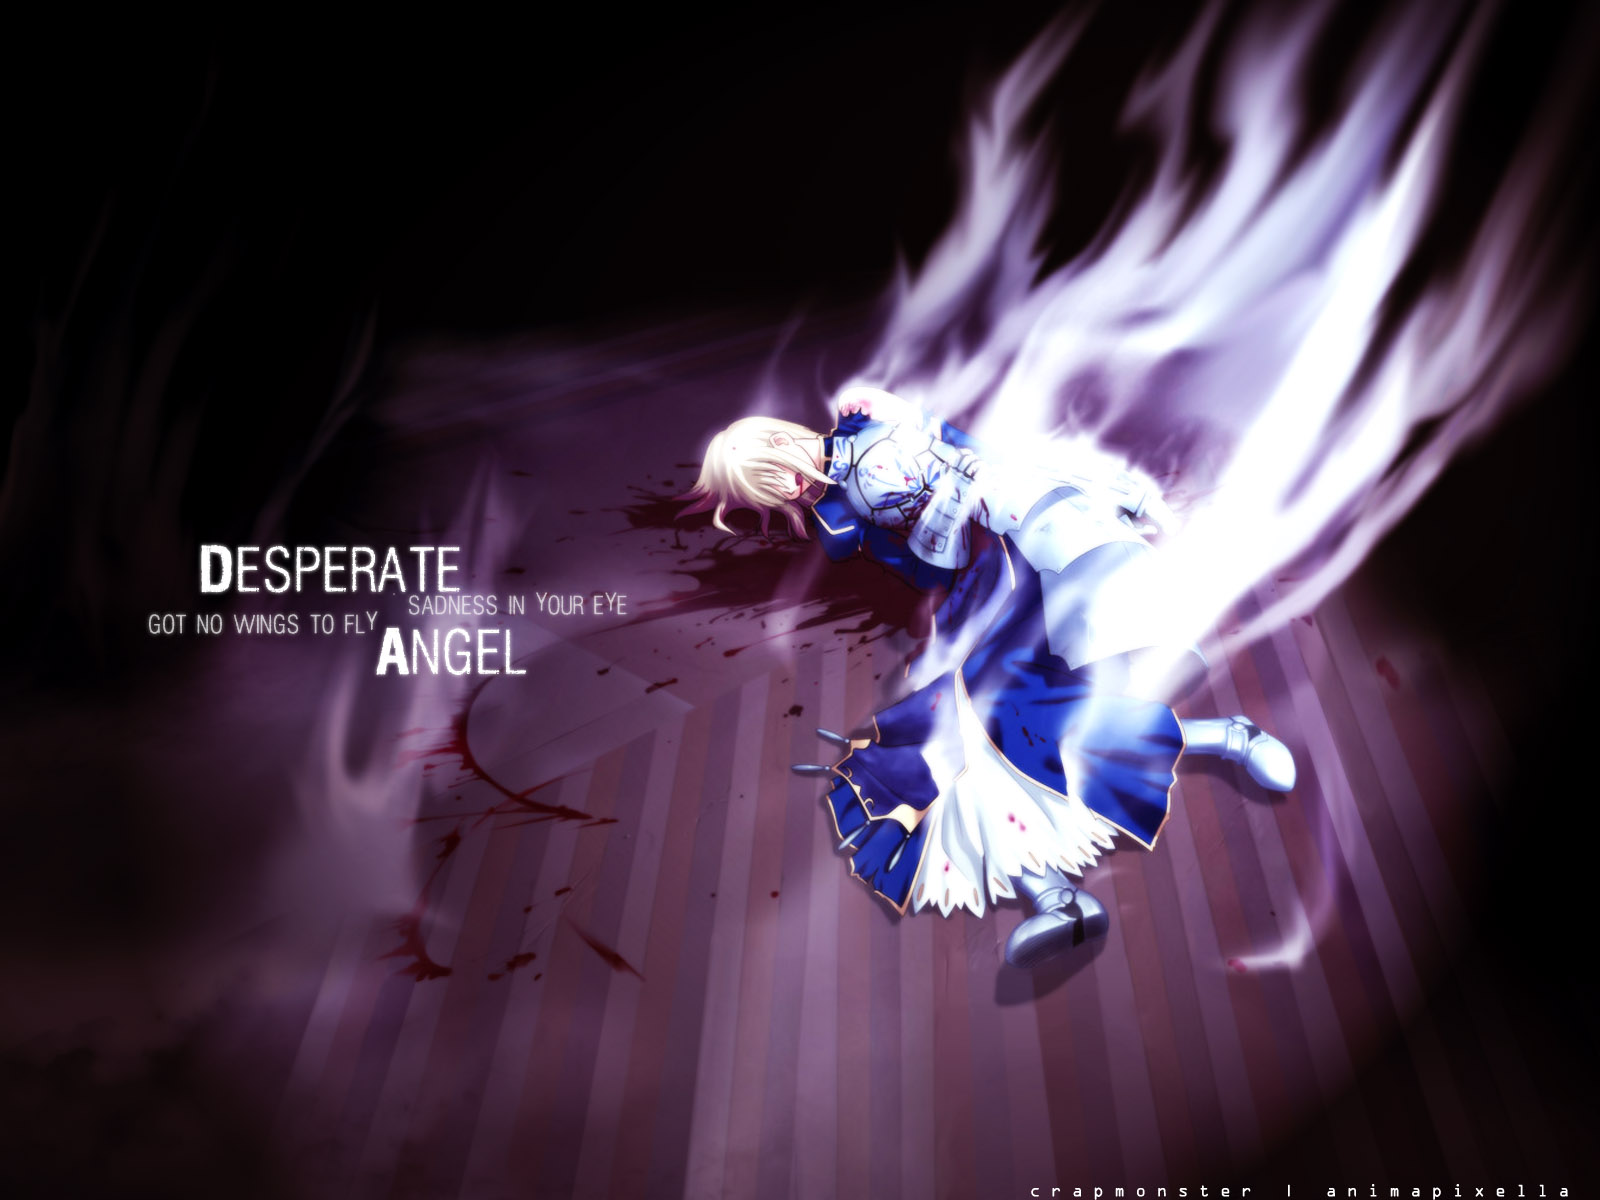 Godly Wallpaper Quotes Fate Stay Night Wallpaper Desperate Angel Minitokyo